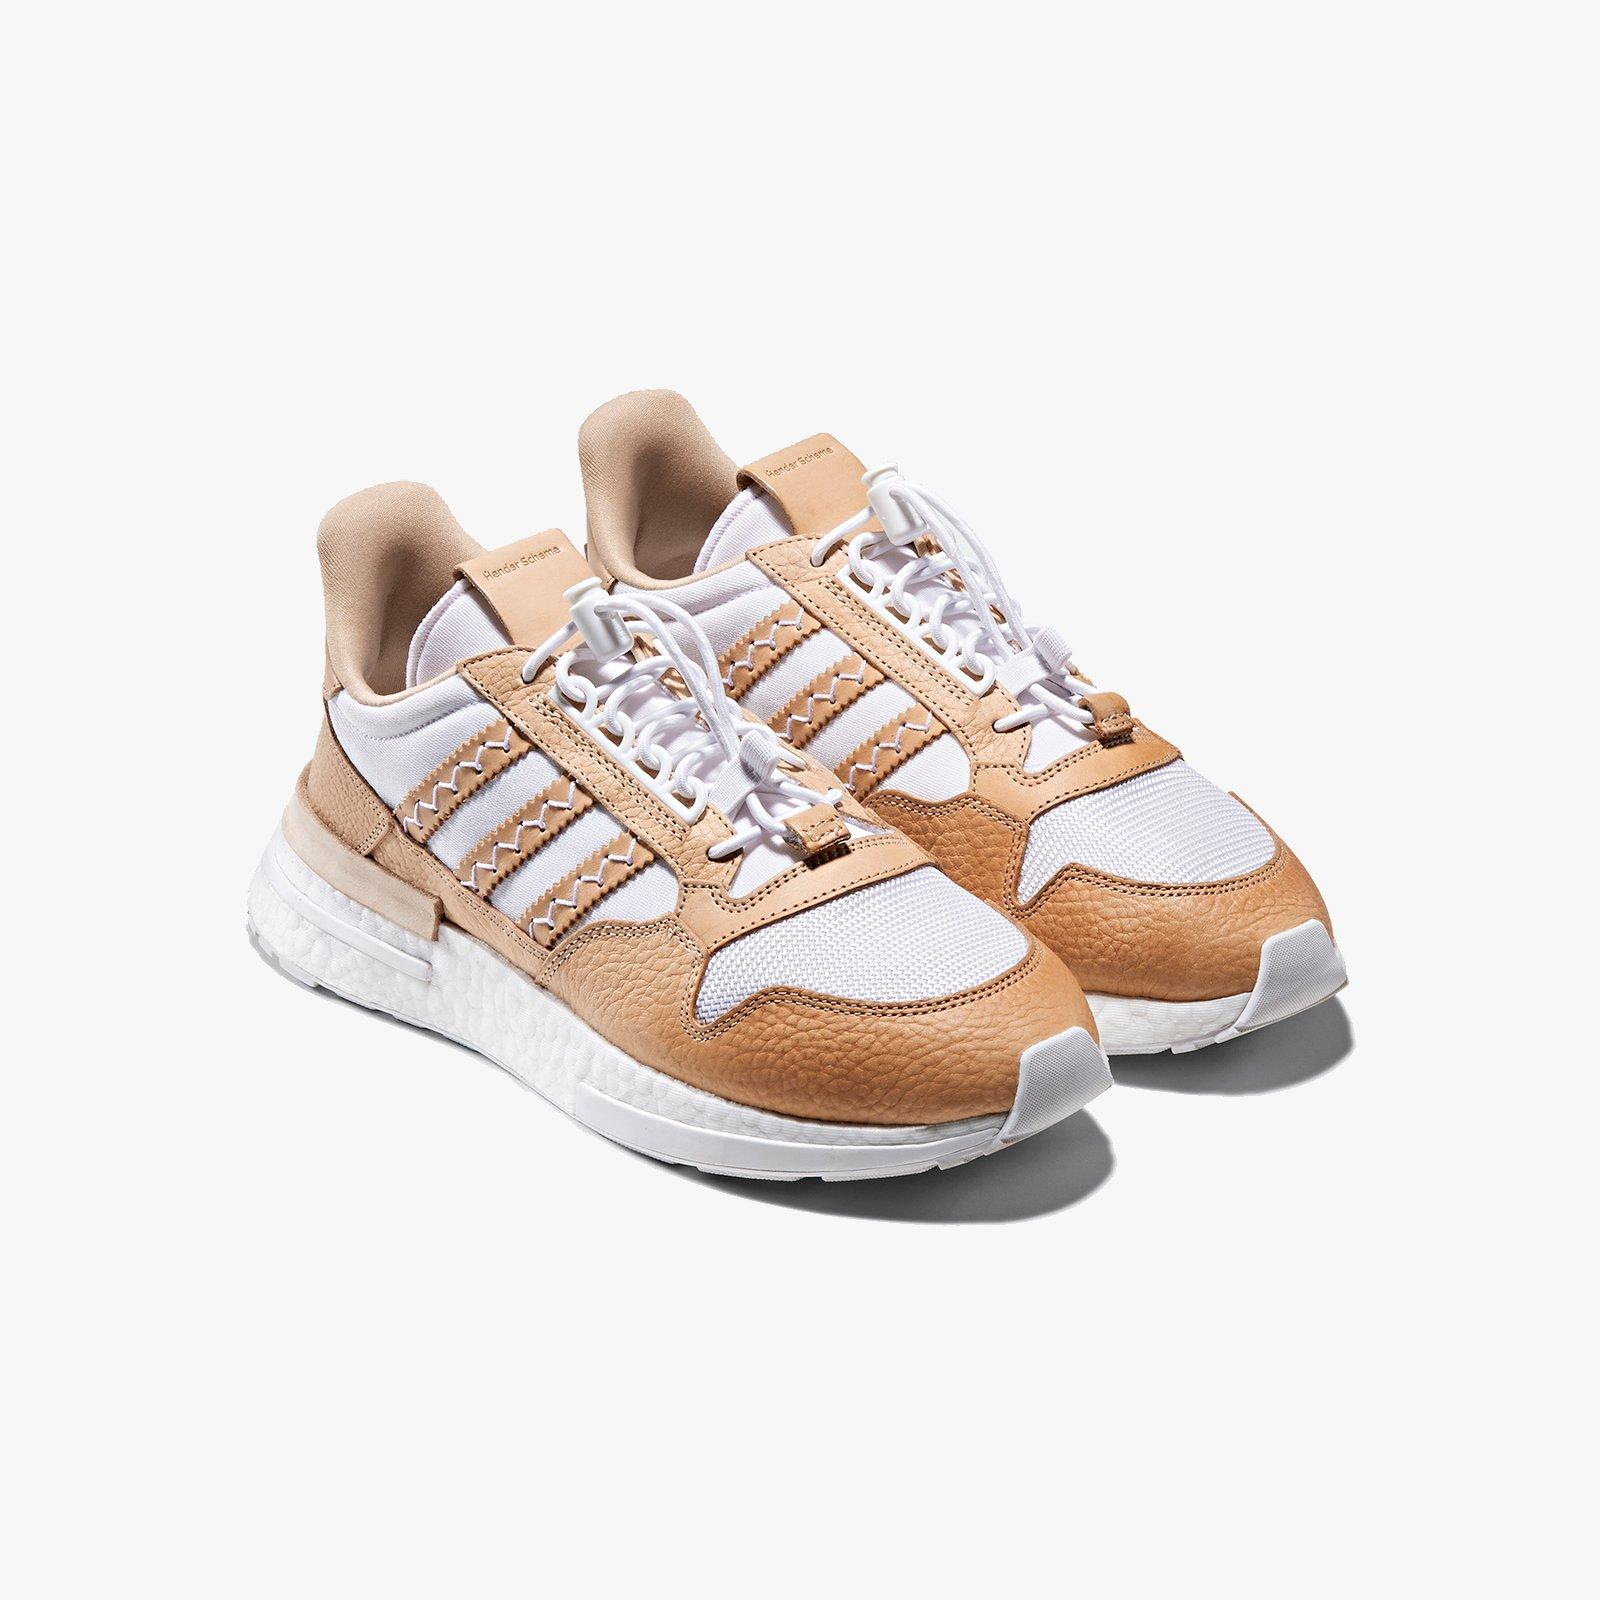 2fb8cf68ae2cb adidas ZX 500 RM MT x Hender Scheme - F36047 - Sneakersnstuff ...